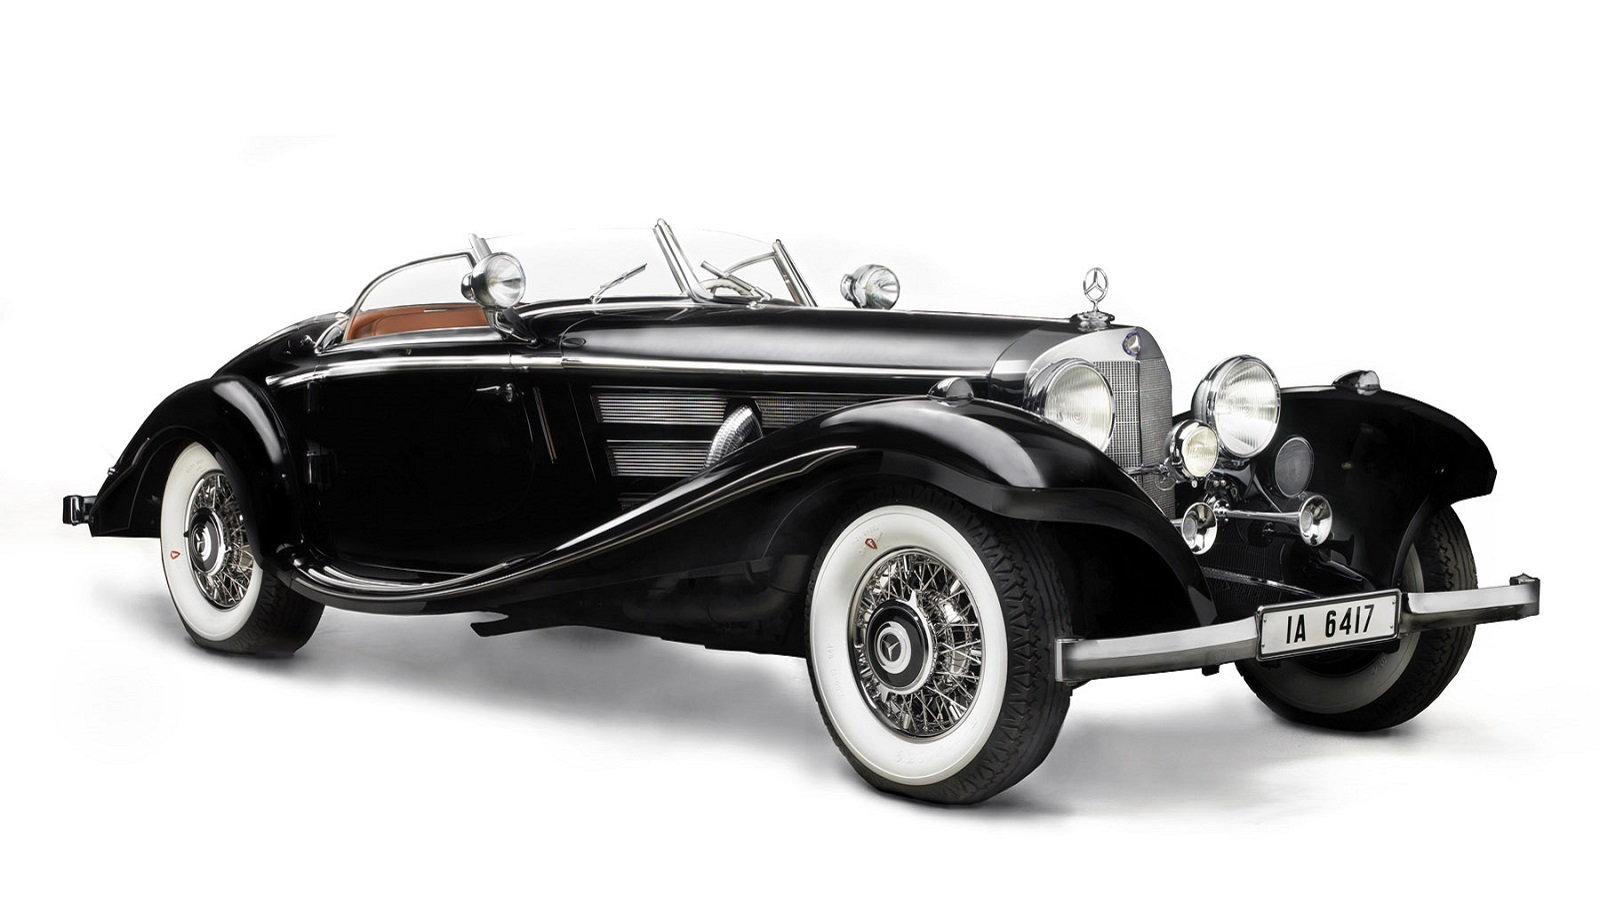 1936 Mercedes-Benz 540 K Special Roadster